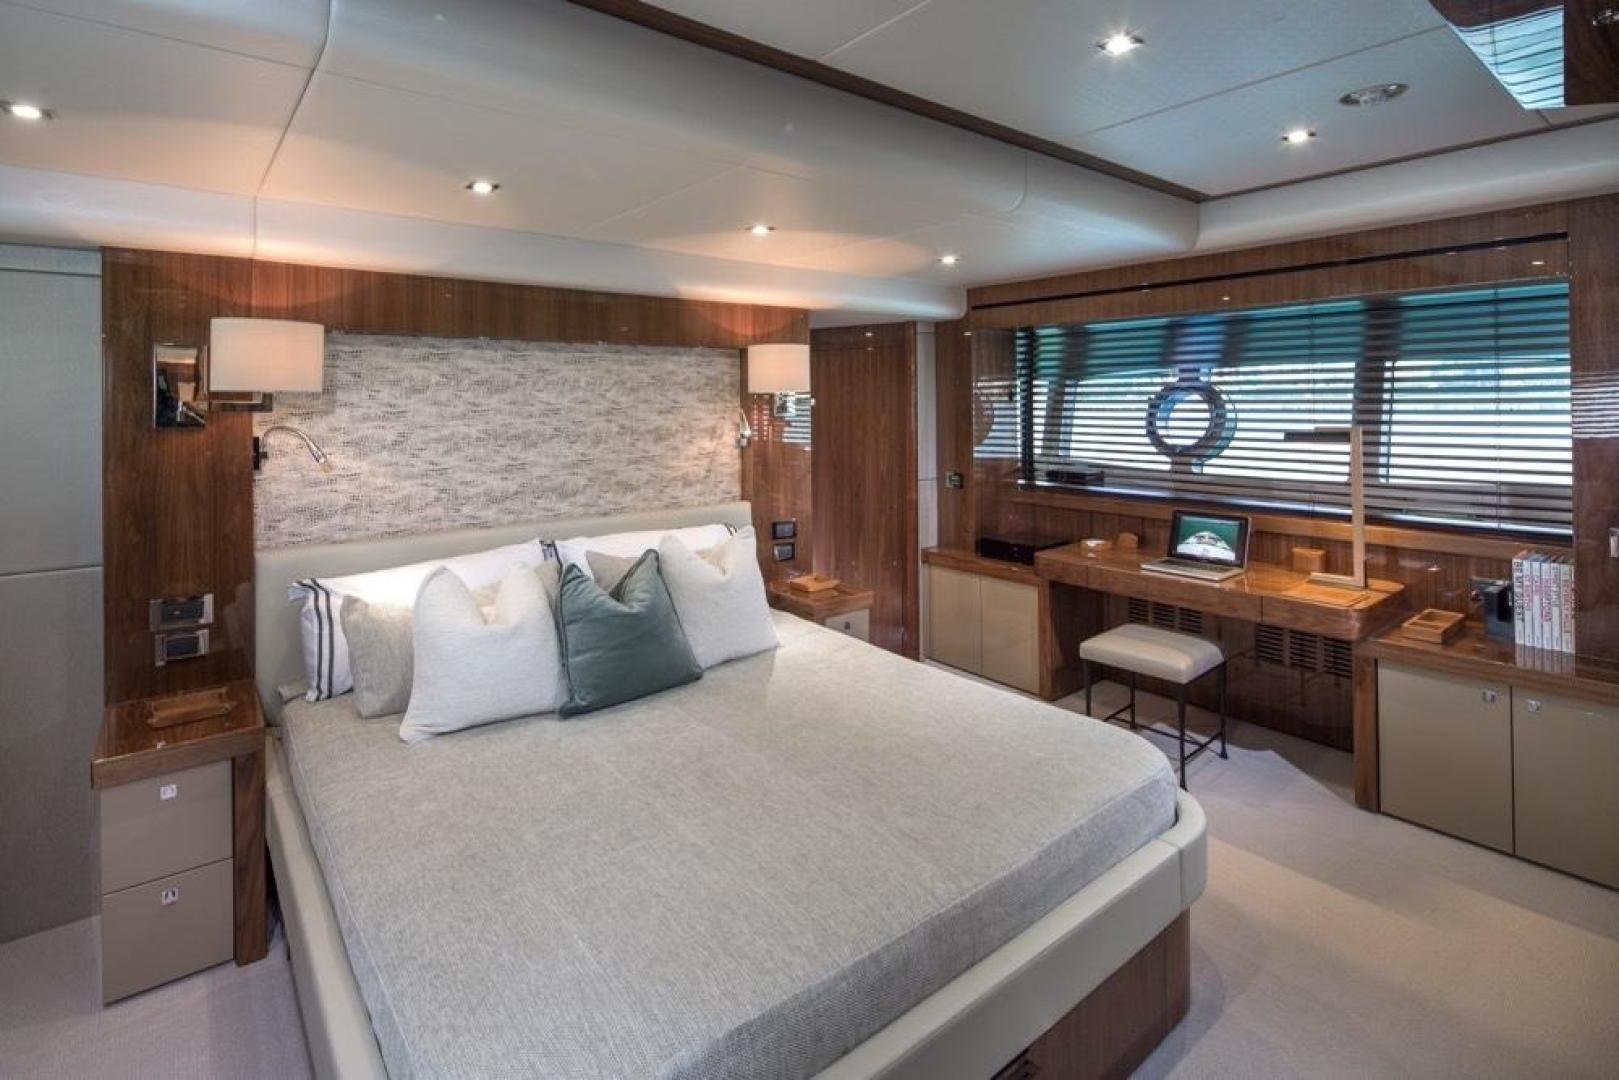 Sunseeker-28 Metre Yacht 2016-RIII Miami-Florida-United States-600117 | Thumbnail